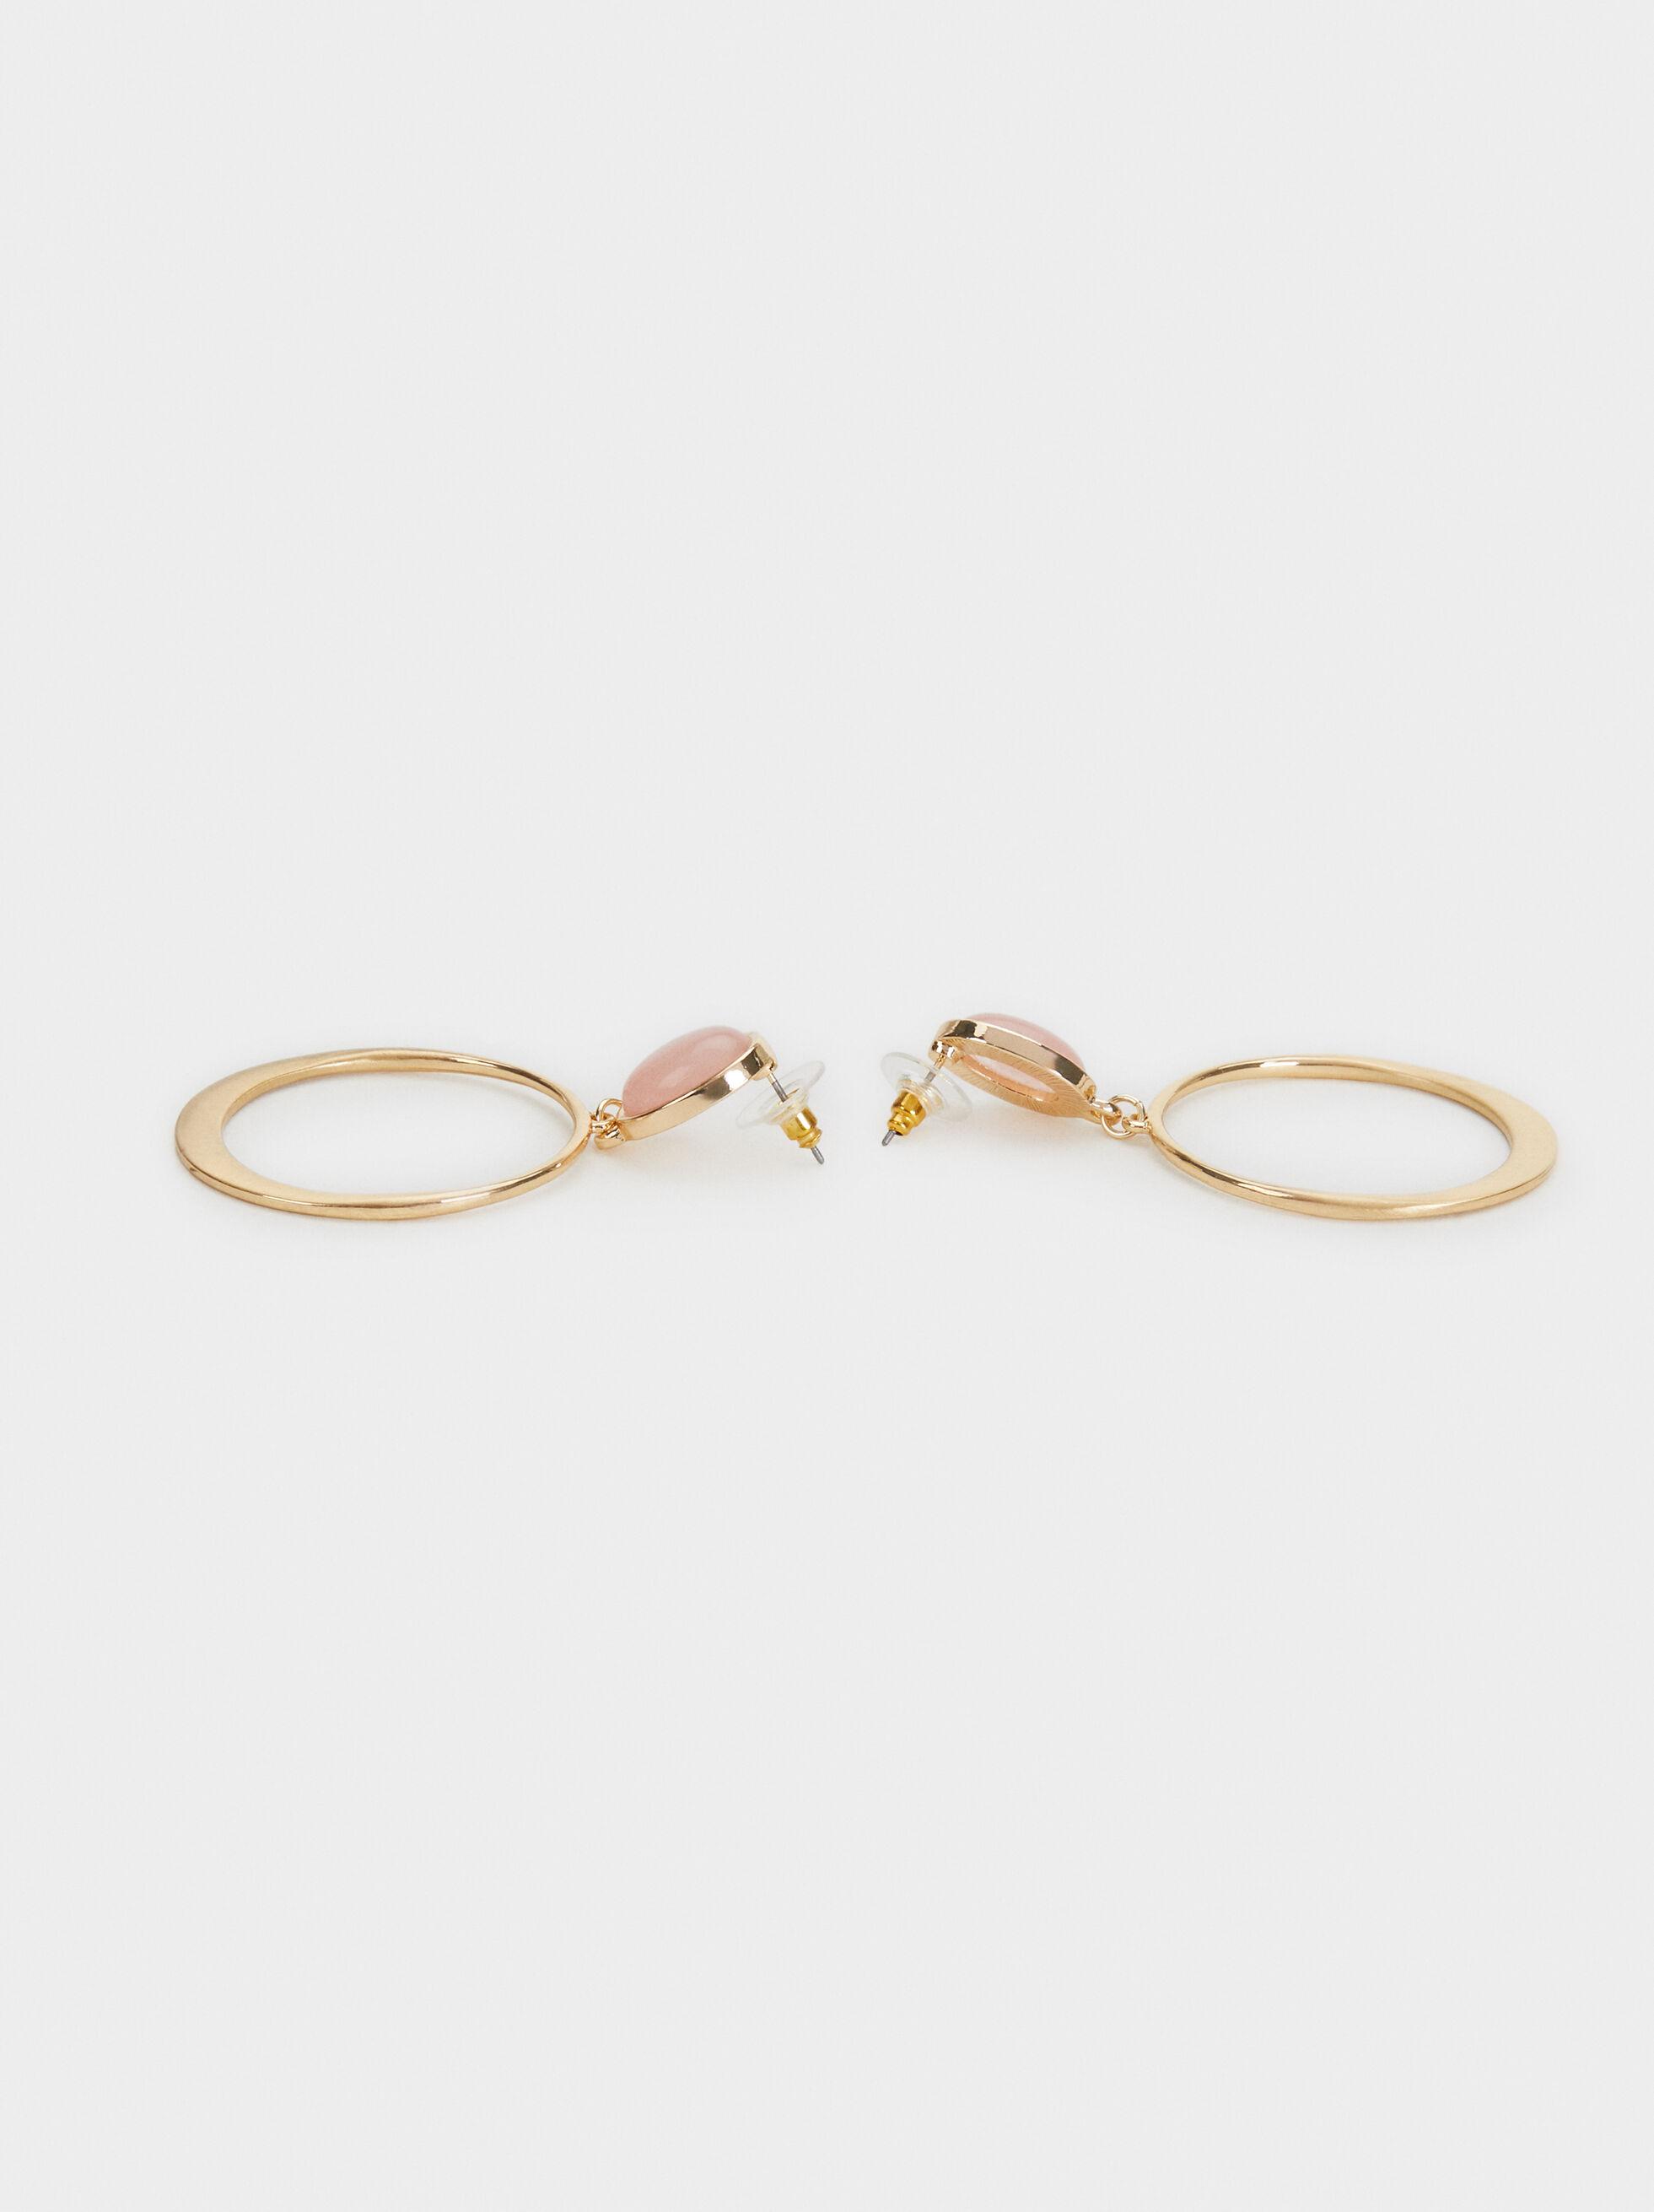 Stone Story Earrings, Pink, hi-res